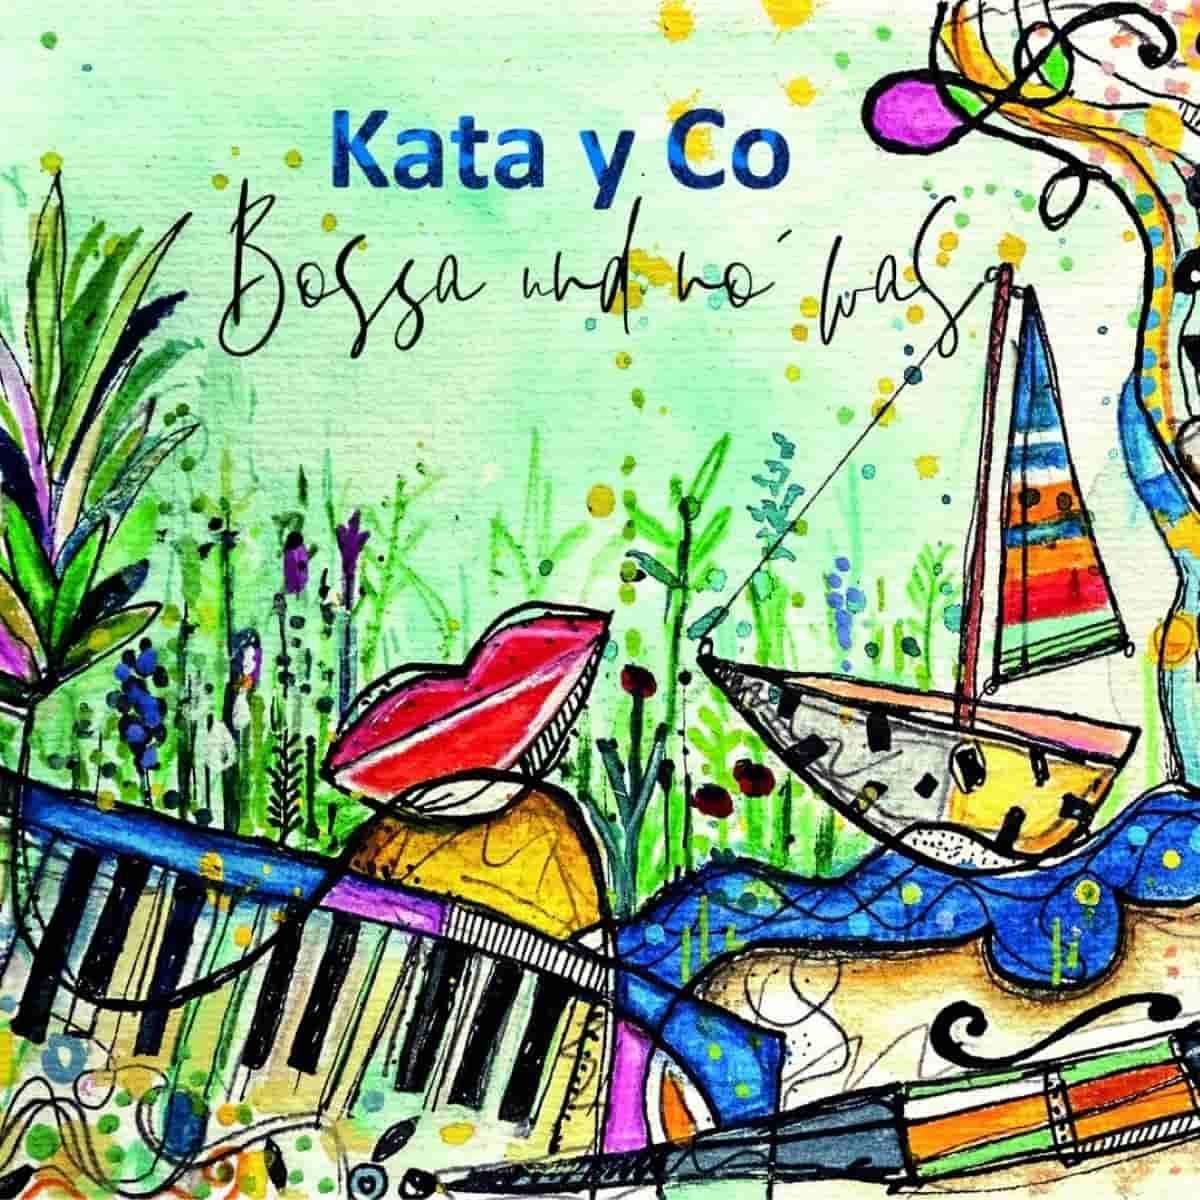 Kata y Co - CD Bossa und no' was